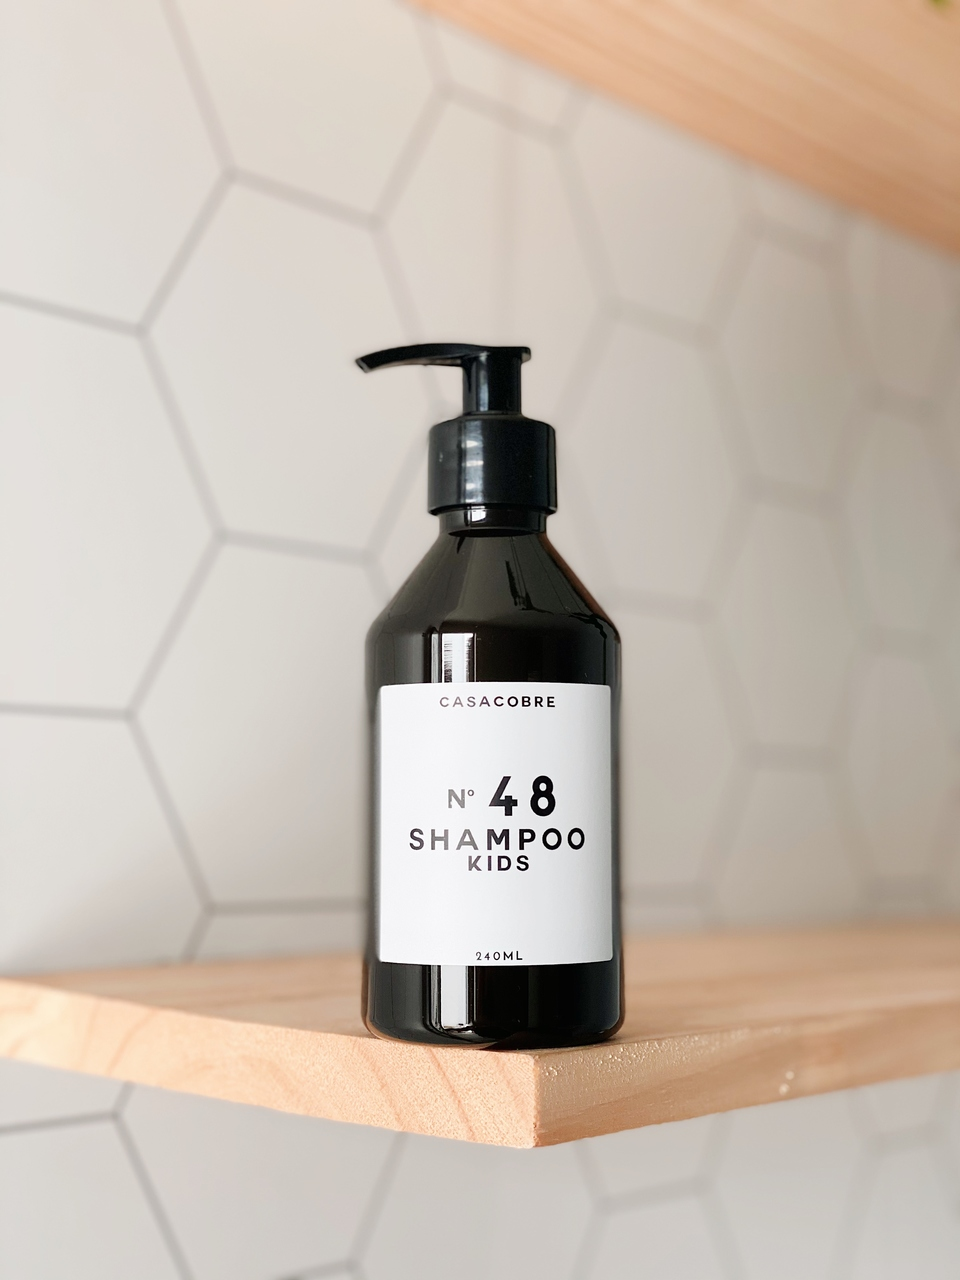 Mini Frasco Black Shampoo Kids - 240ml  - CASACOBRE